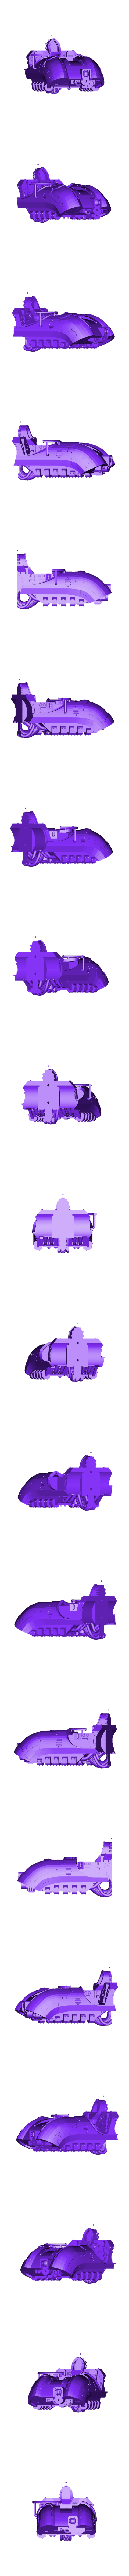 SpeederFuselageFront.stl Download free STL file Angry Air - Frugal Displeased Soldier Deployment Vessel • 3D printing model, FelixTheCrazy